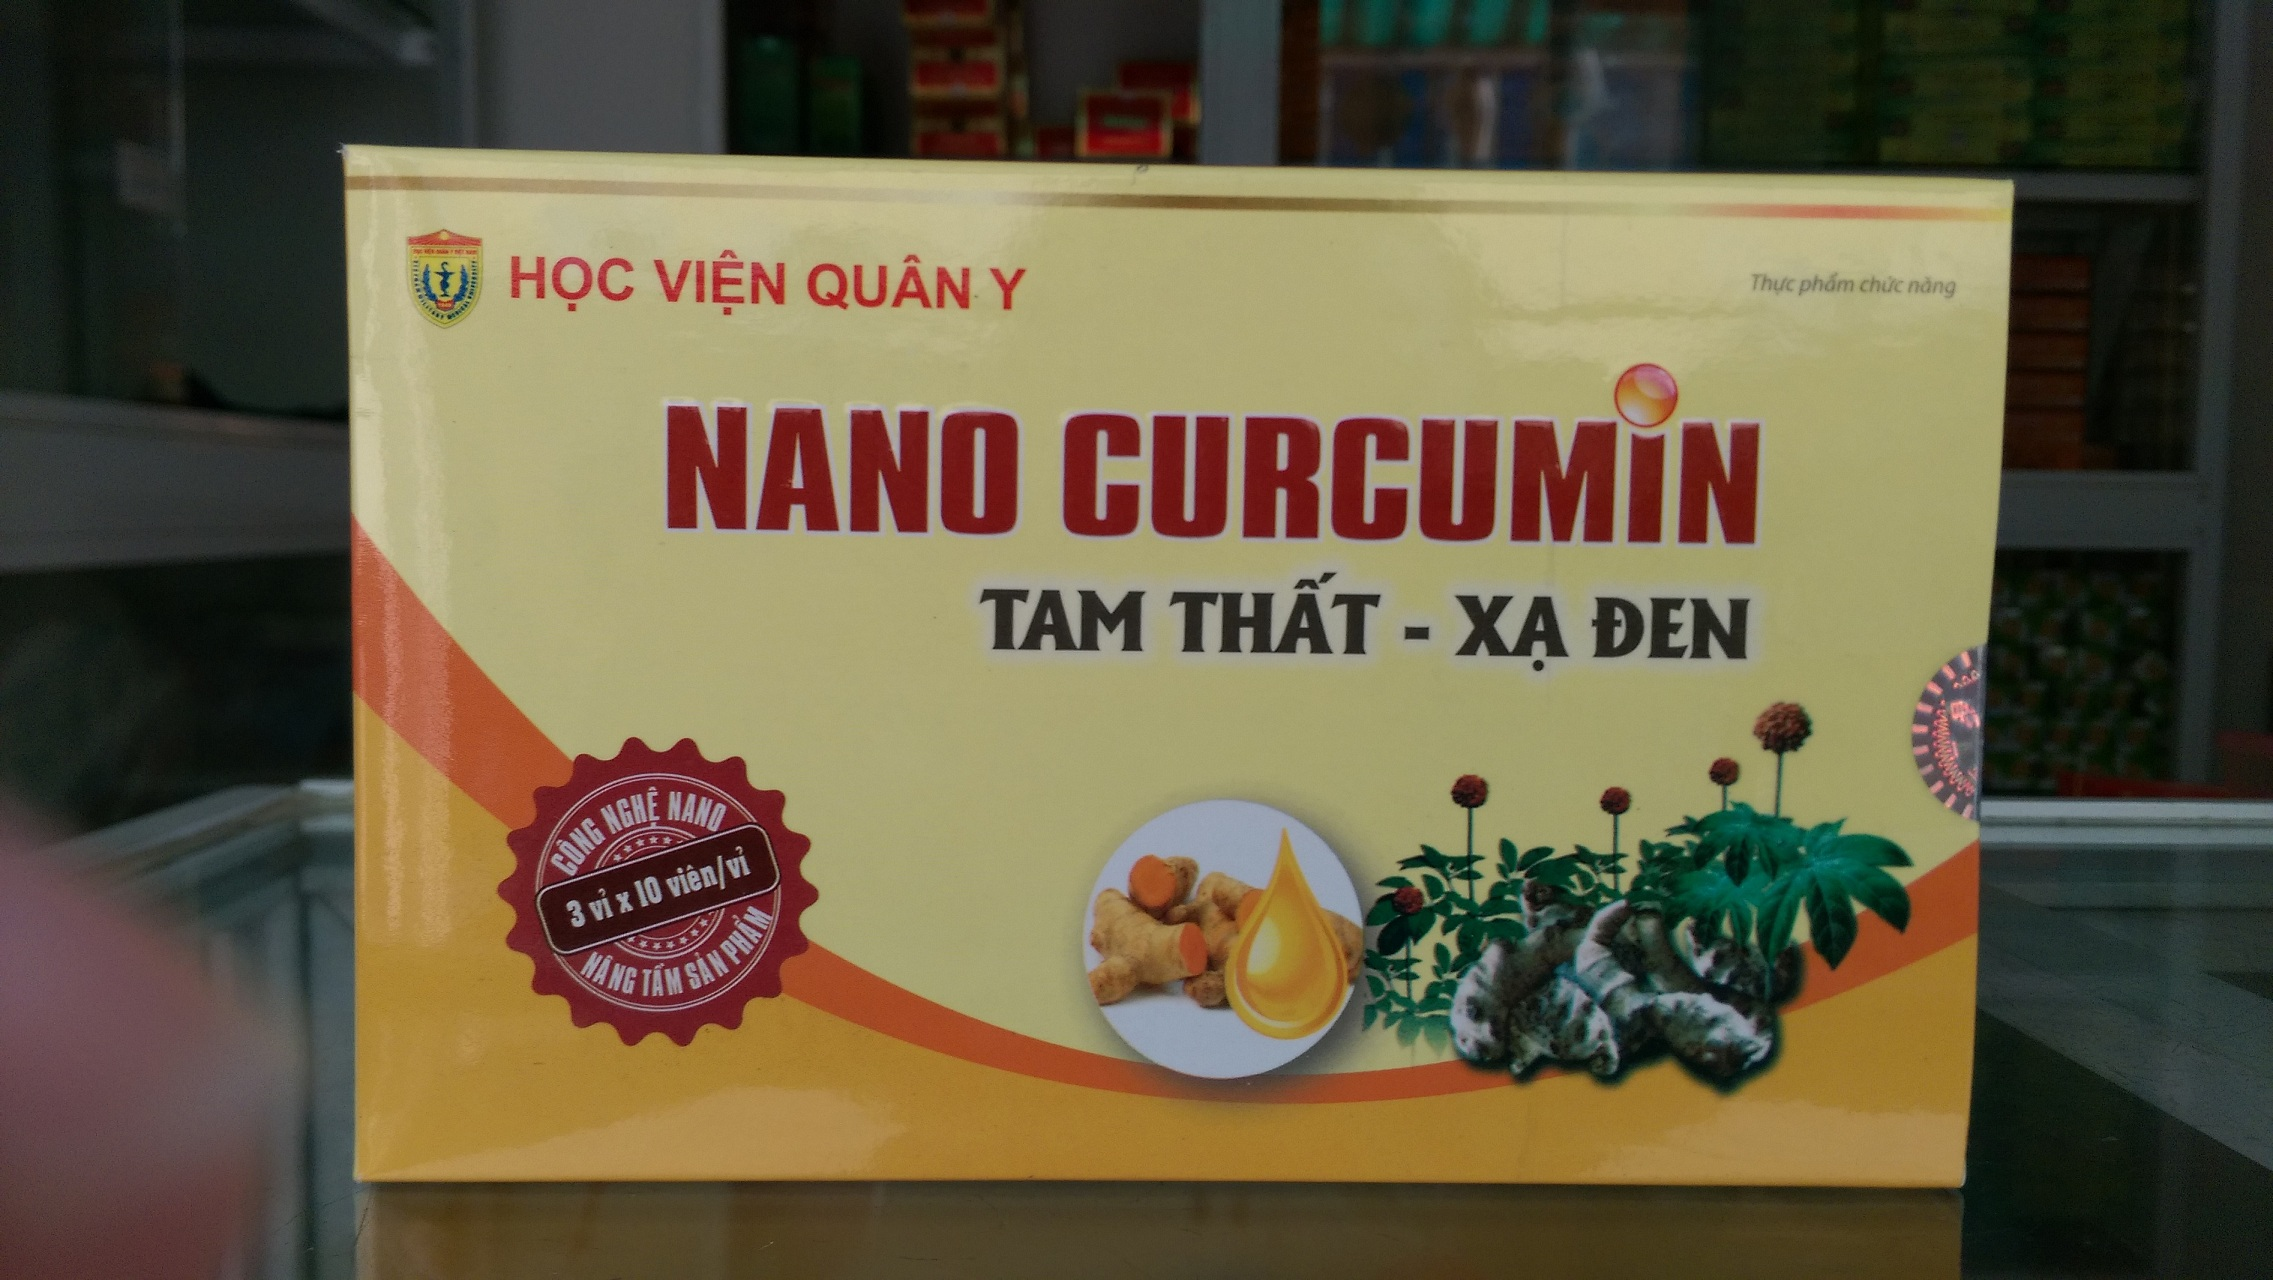 nano curcumin tam thất xạ đen 1